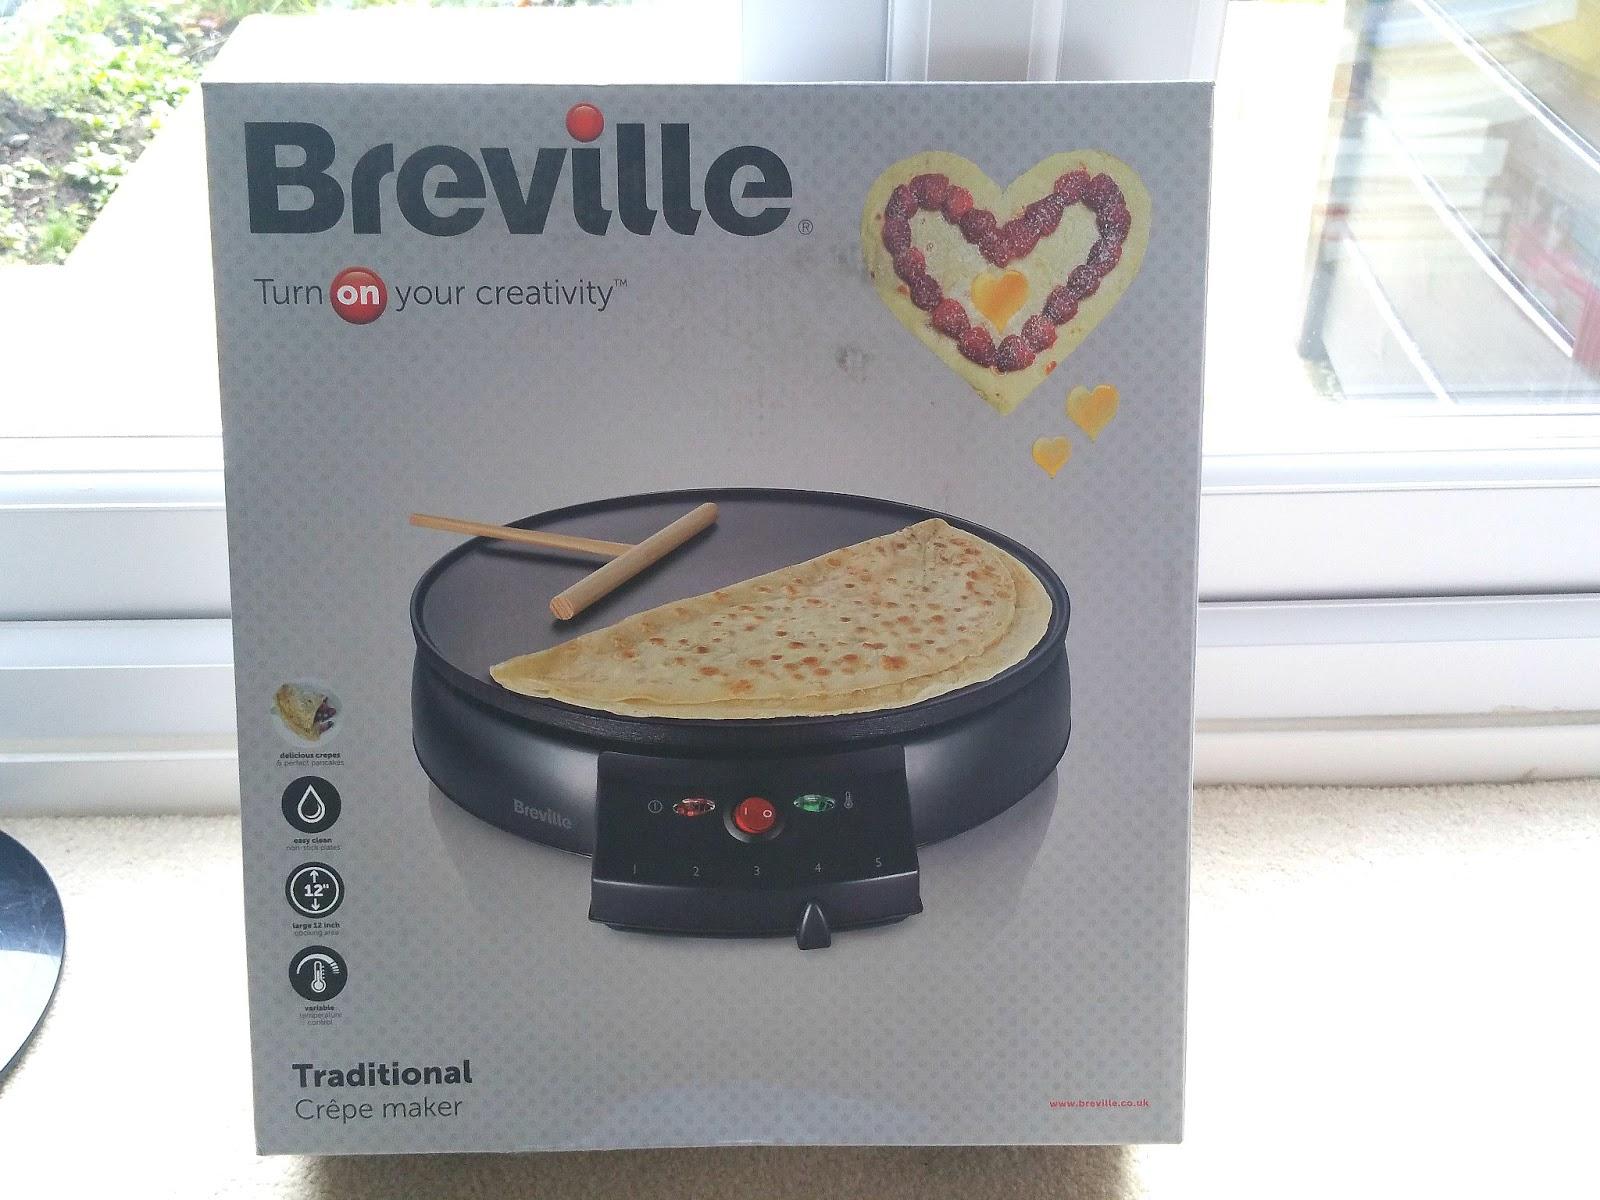 Breville Crepe Maker, Pancake maker, Pancake Day